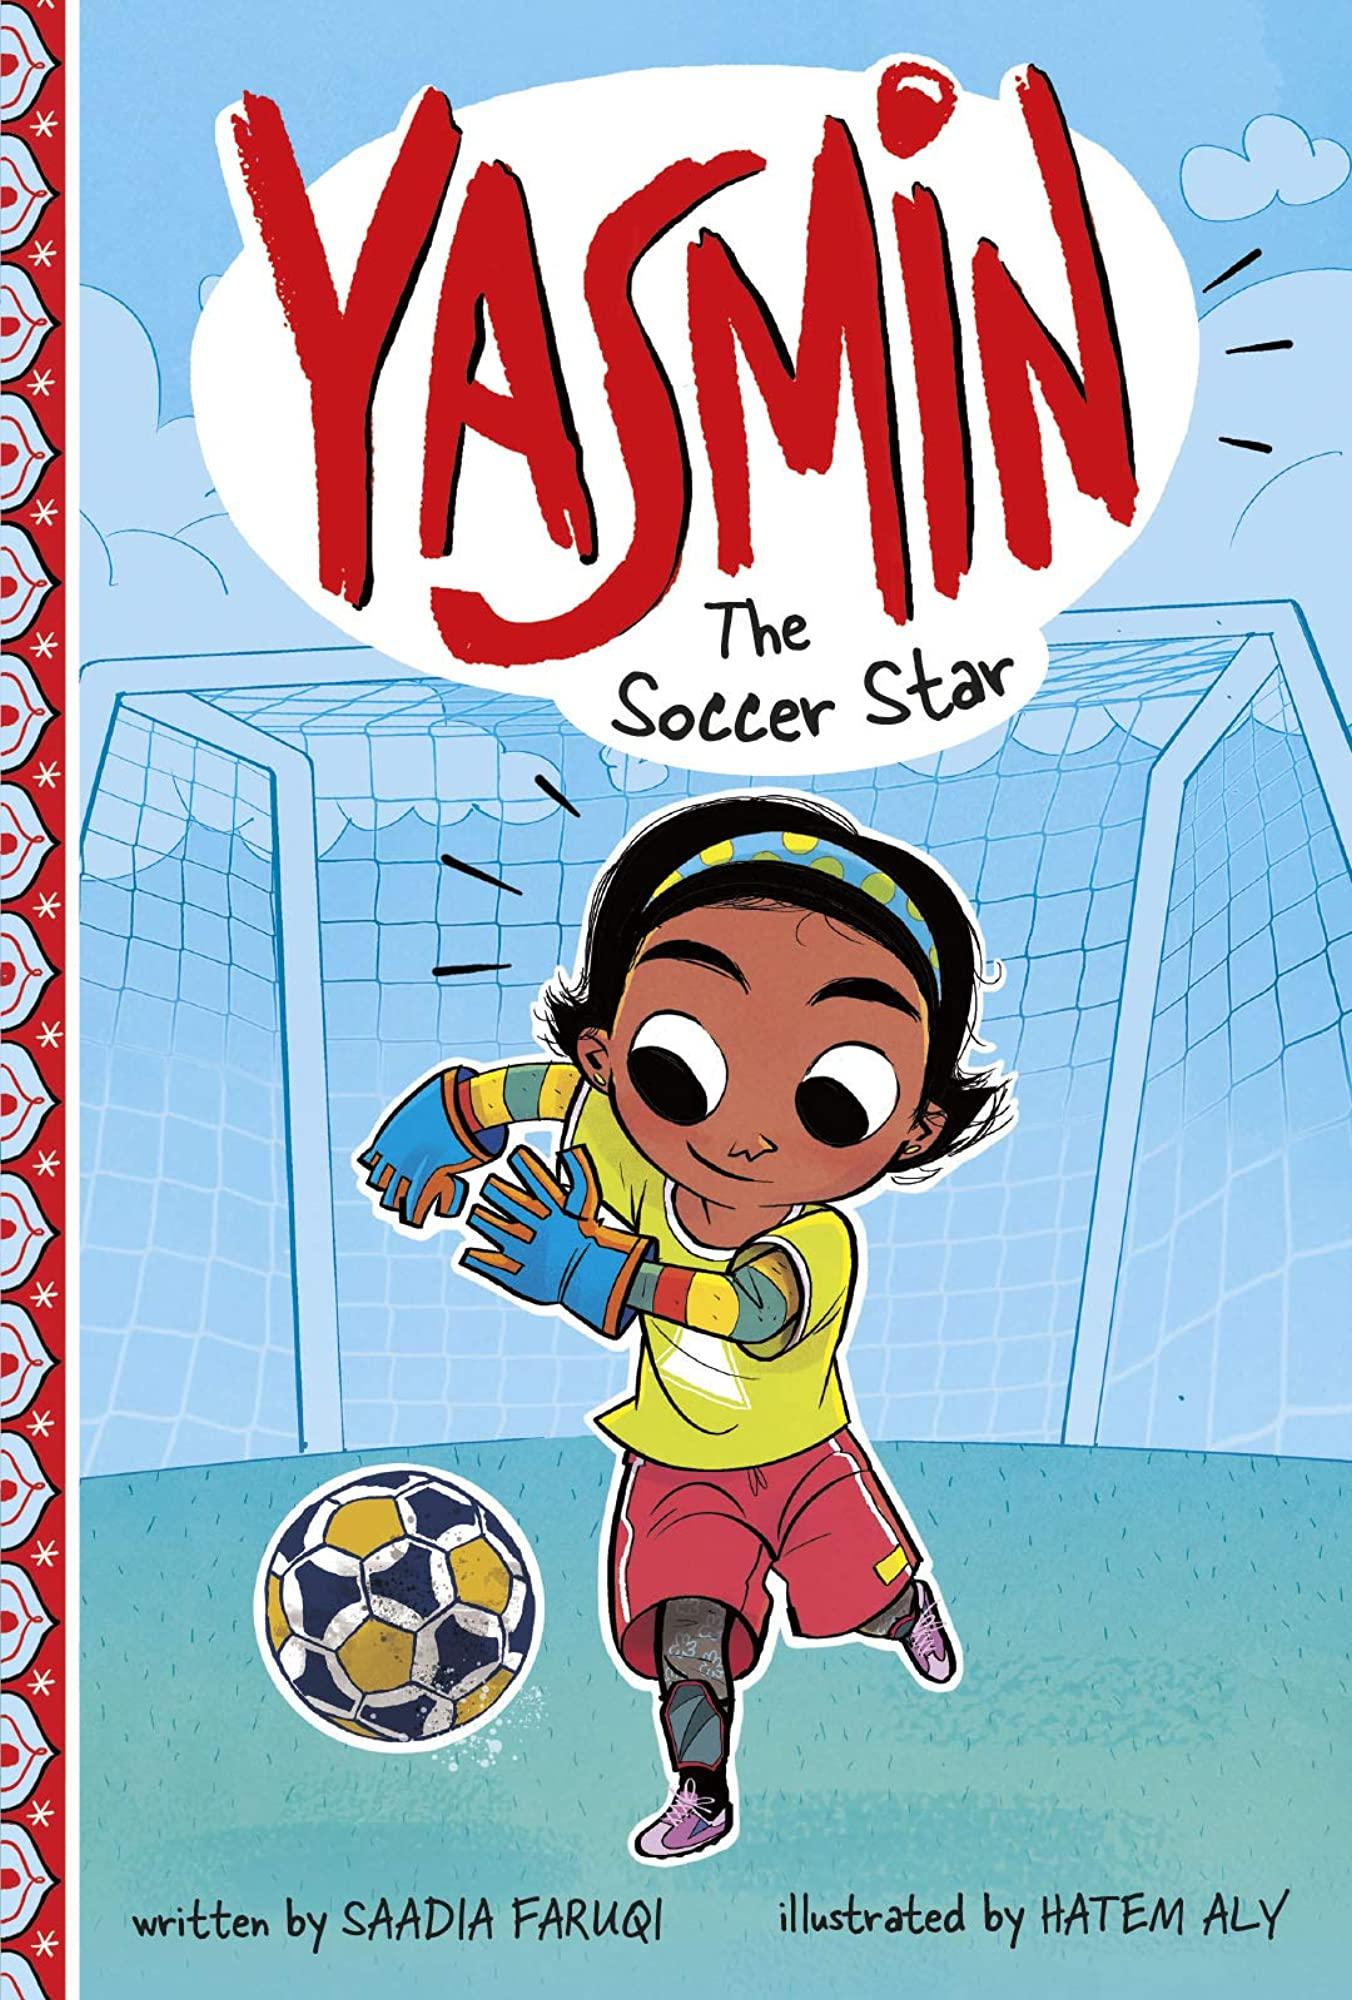 Yasmin: The Soccer Star by Saadia Faruqi